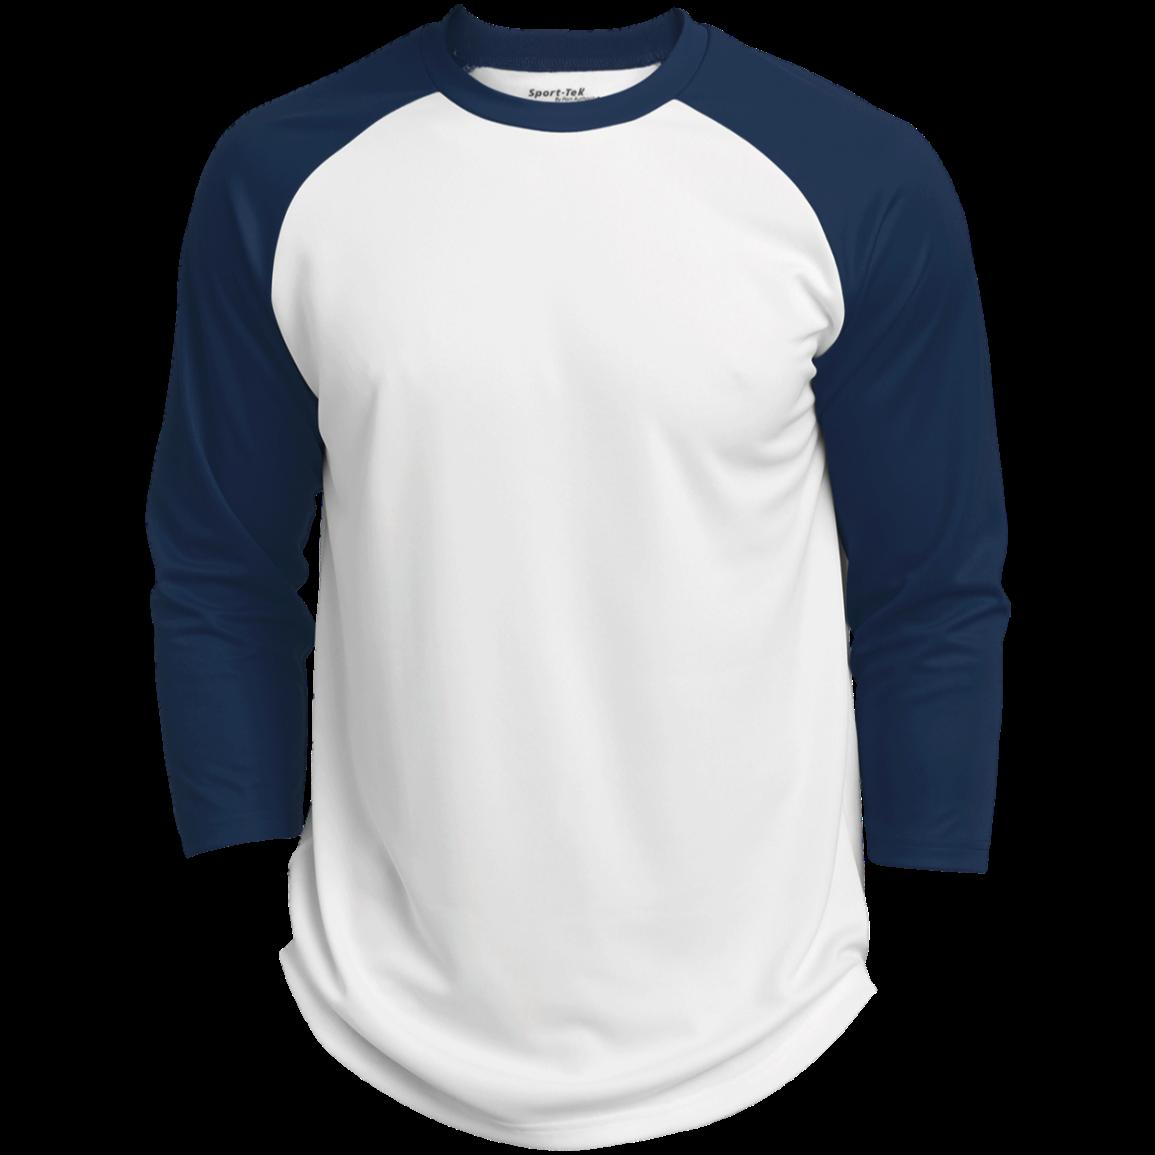 f0e0dfaa7db1 Bel Air High School Polyester Game Baseball Jersey - SpiritShop.com